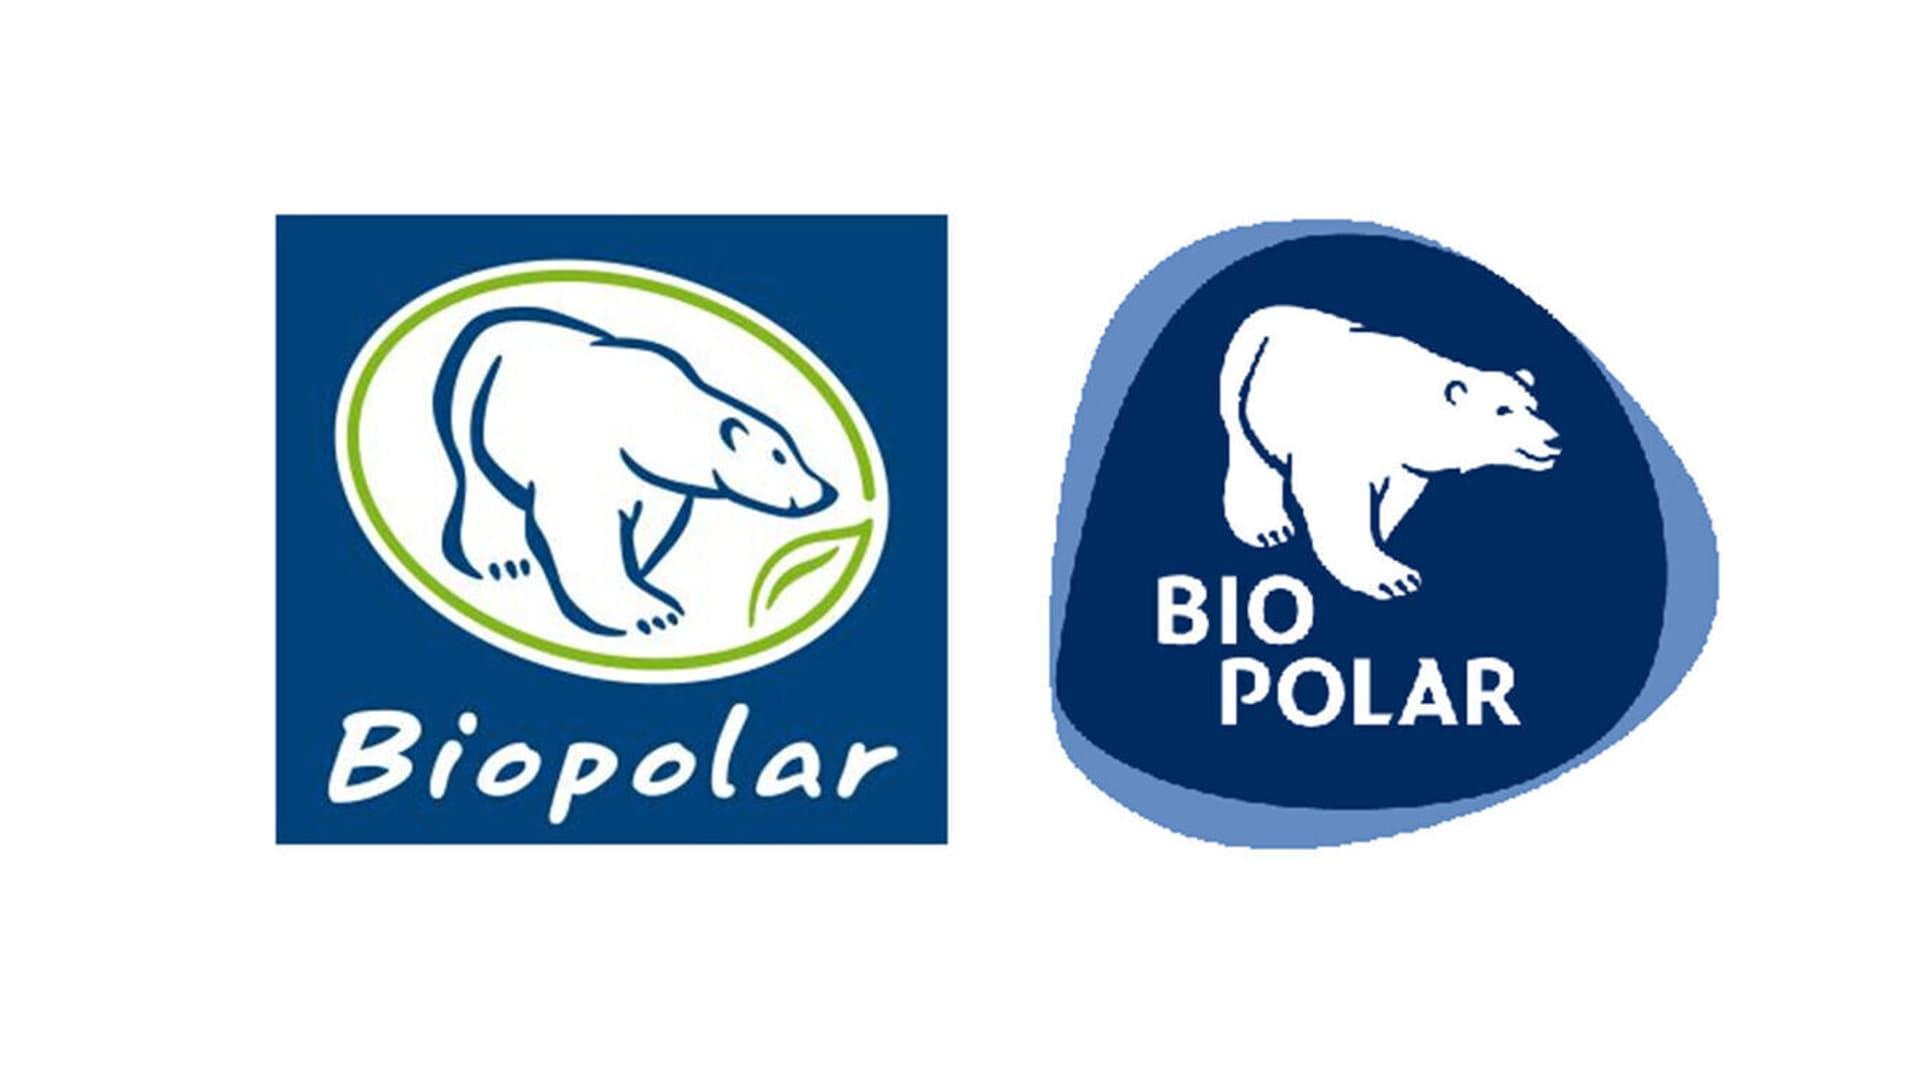 Biopolar-Logos alt und neu